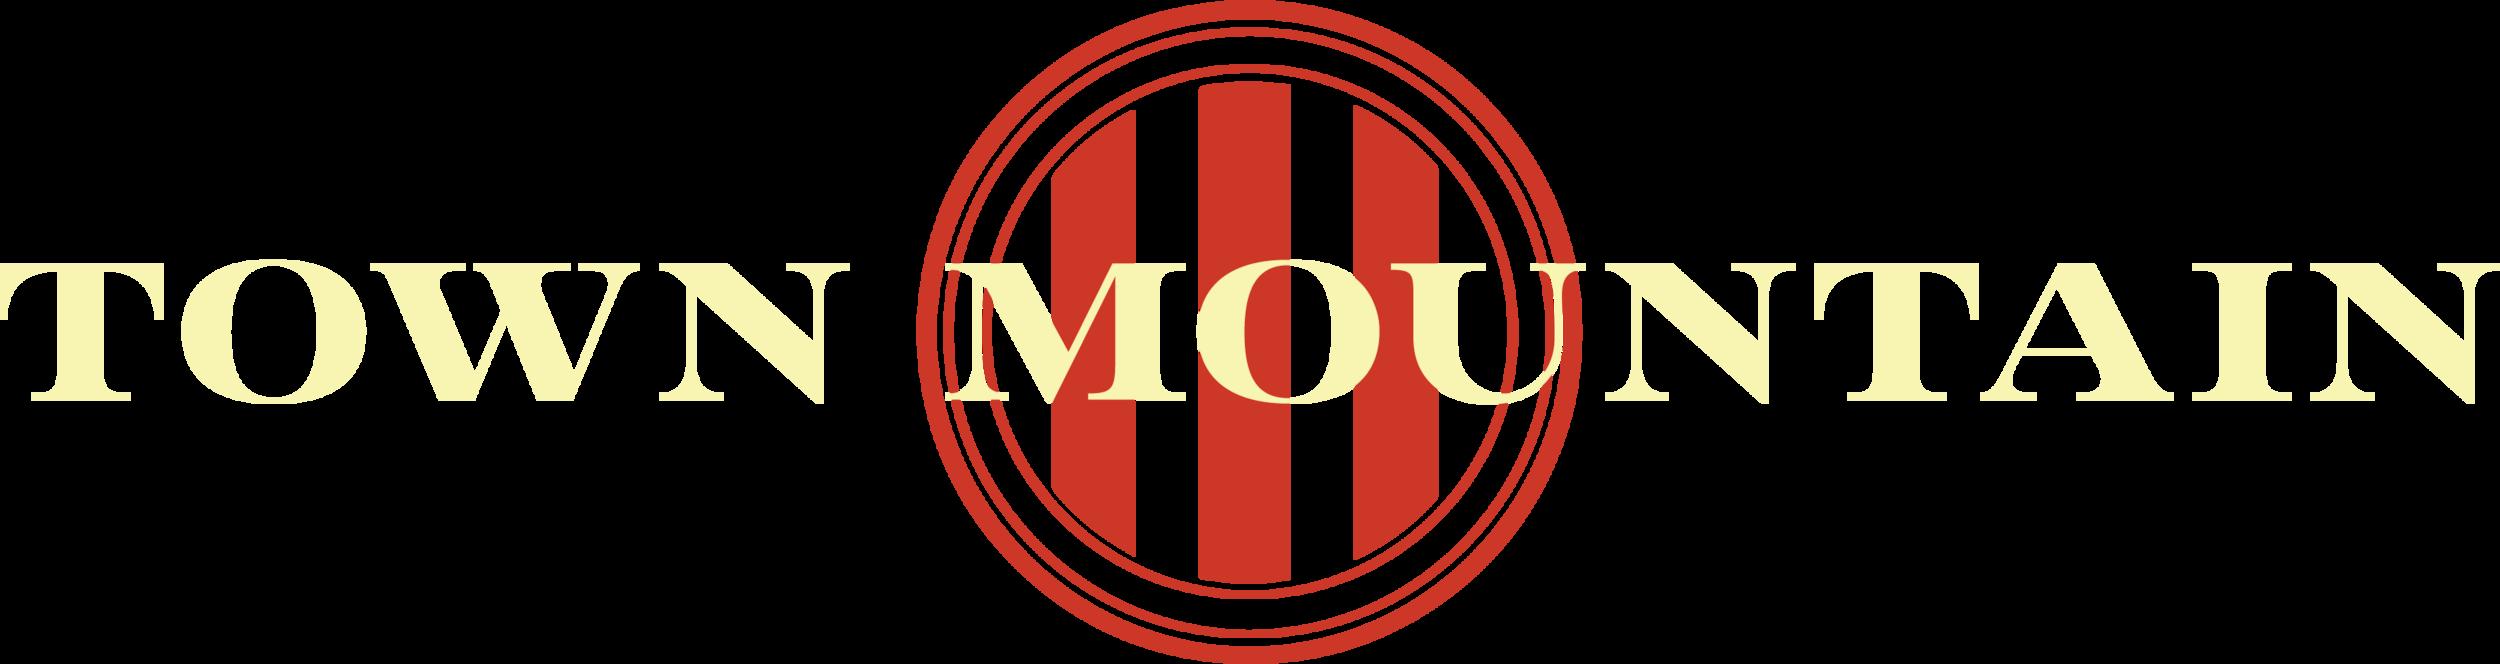 Town_Mountain_logo_home.png